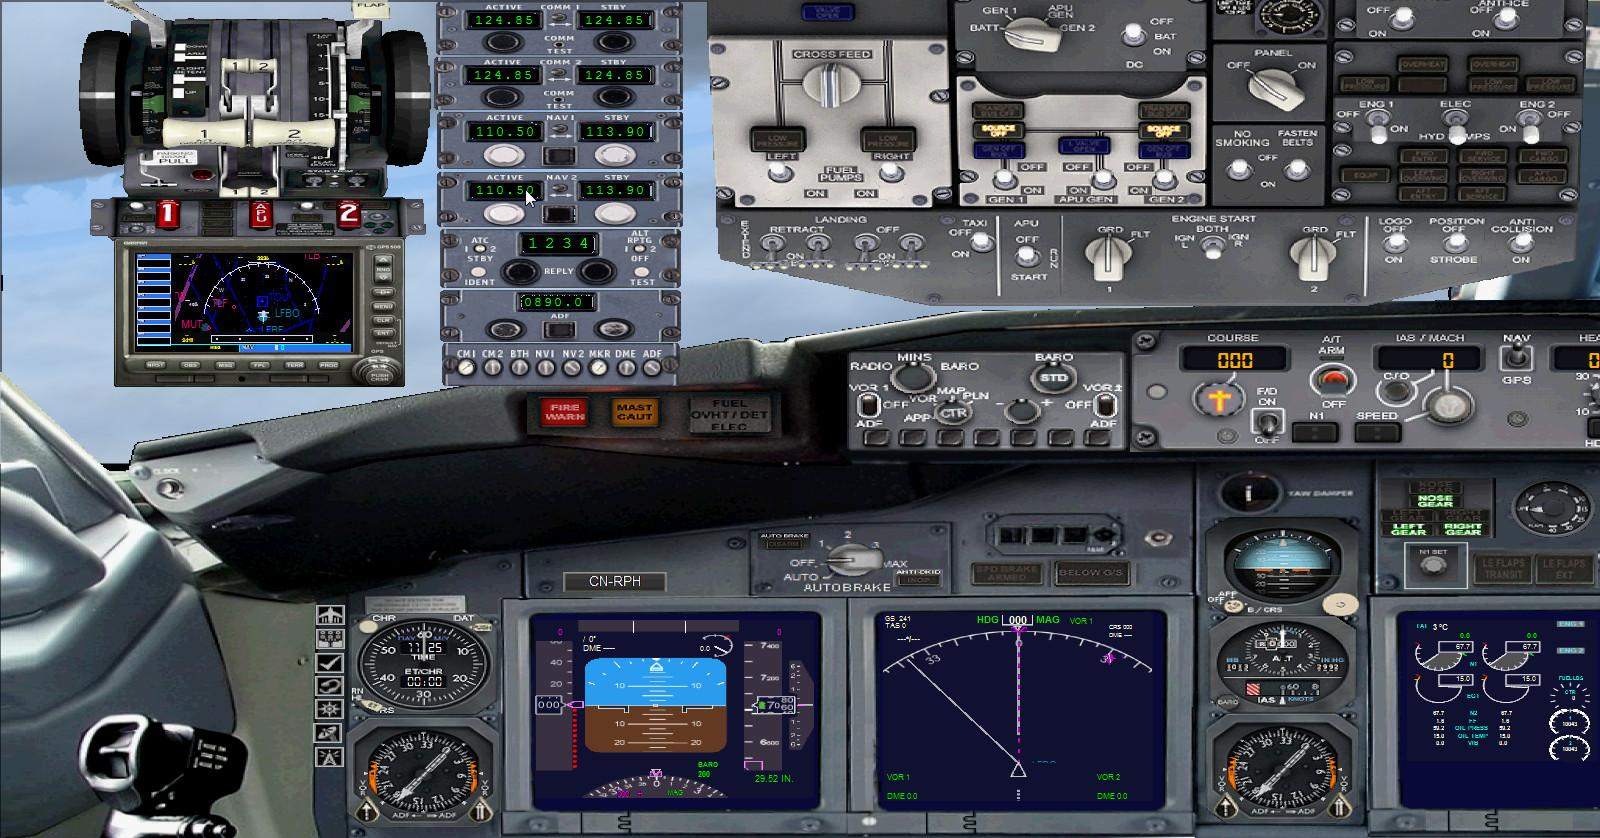 Boeing 737-400 Panel